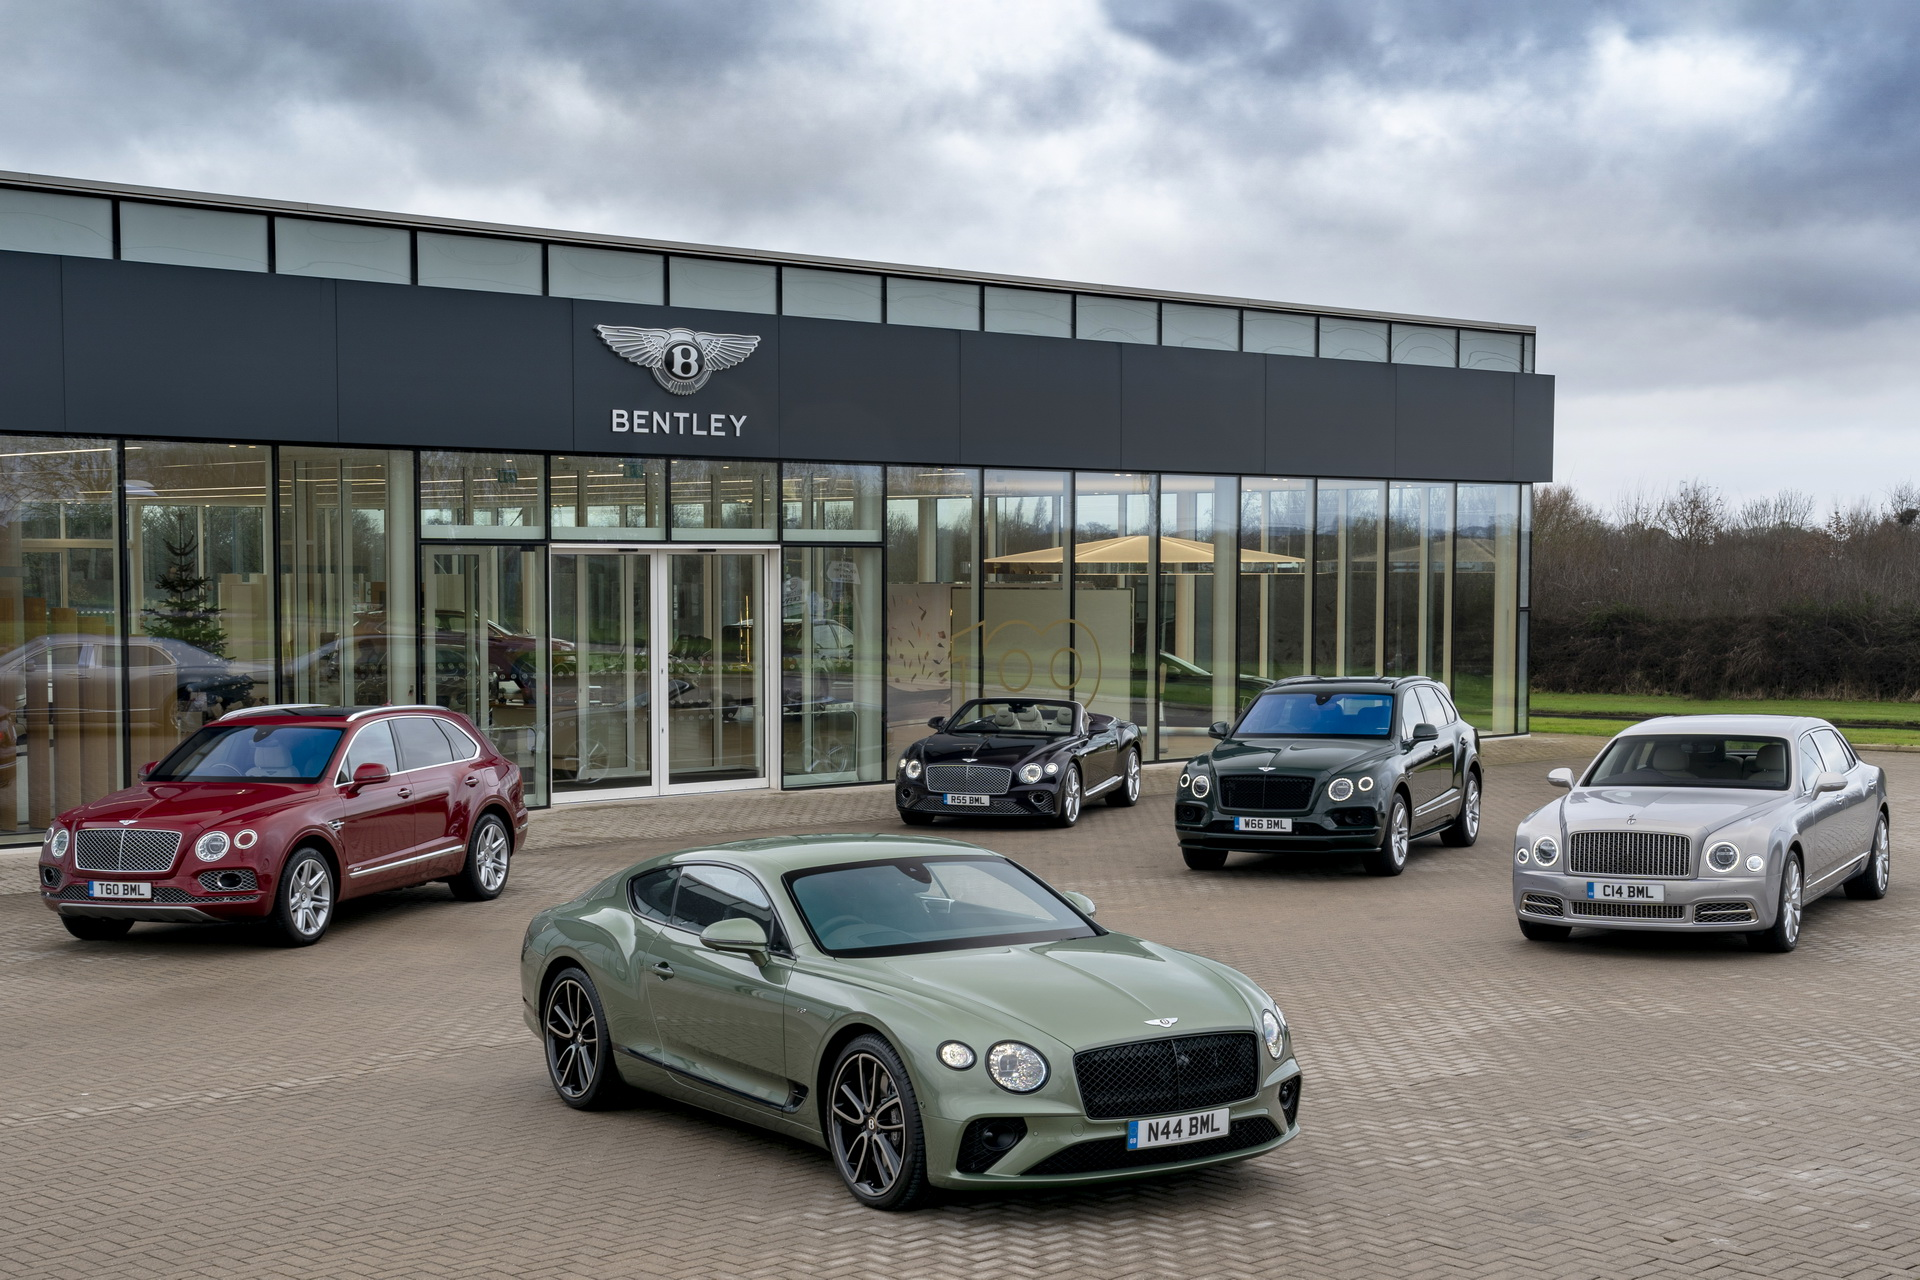 2020-bentley-cars-1.jpg